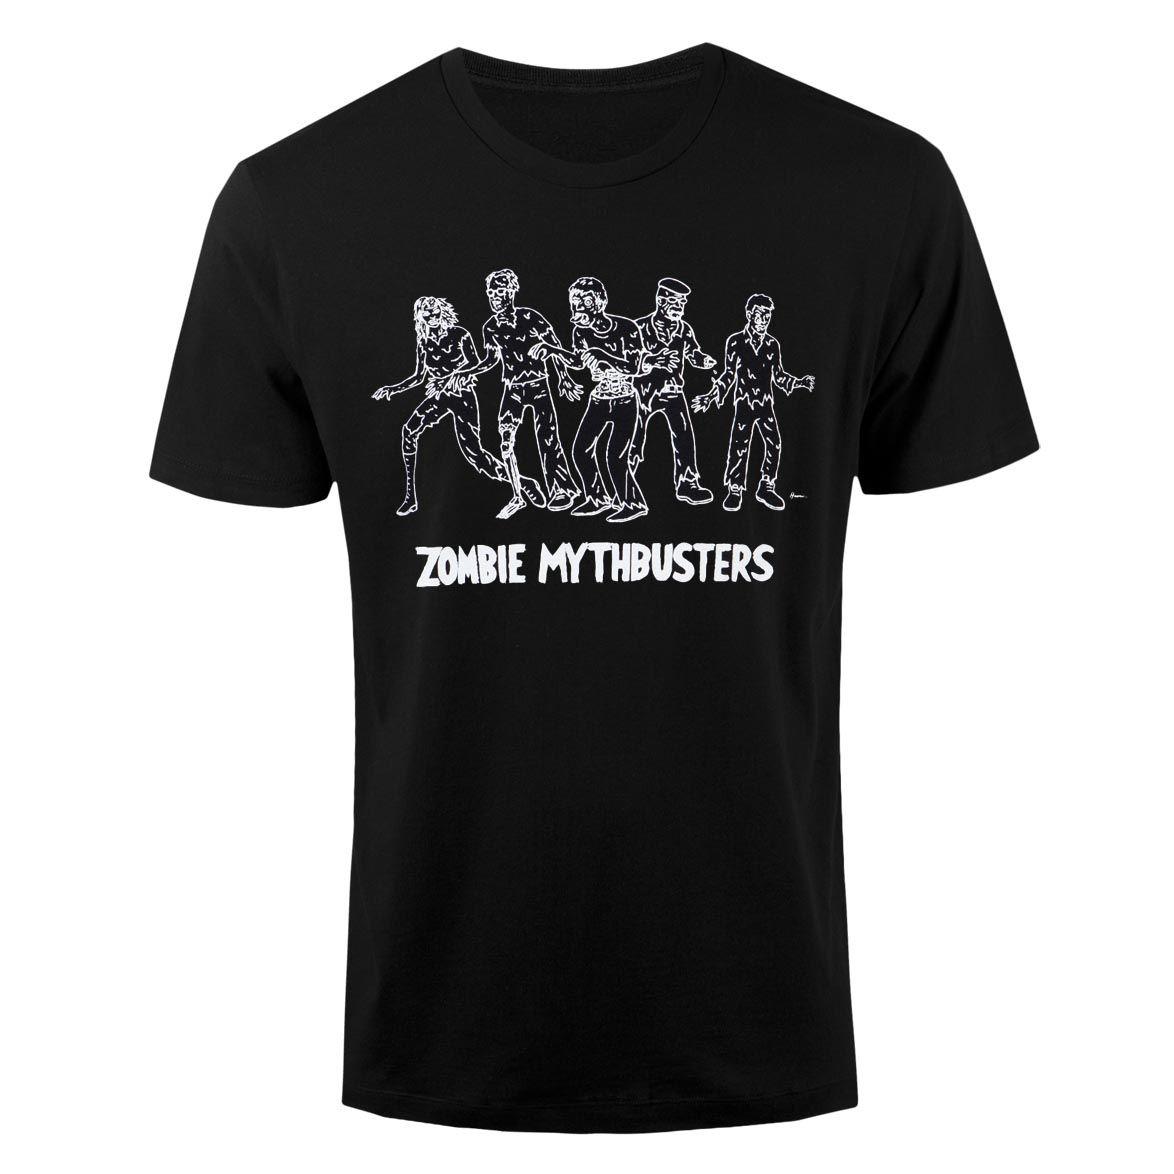 MythBusters Zombie T-Shirt - Black